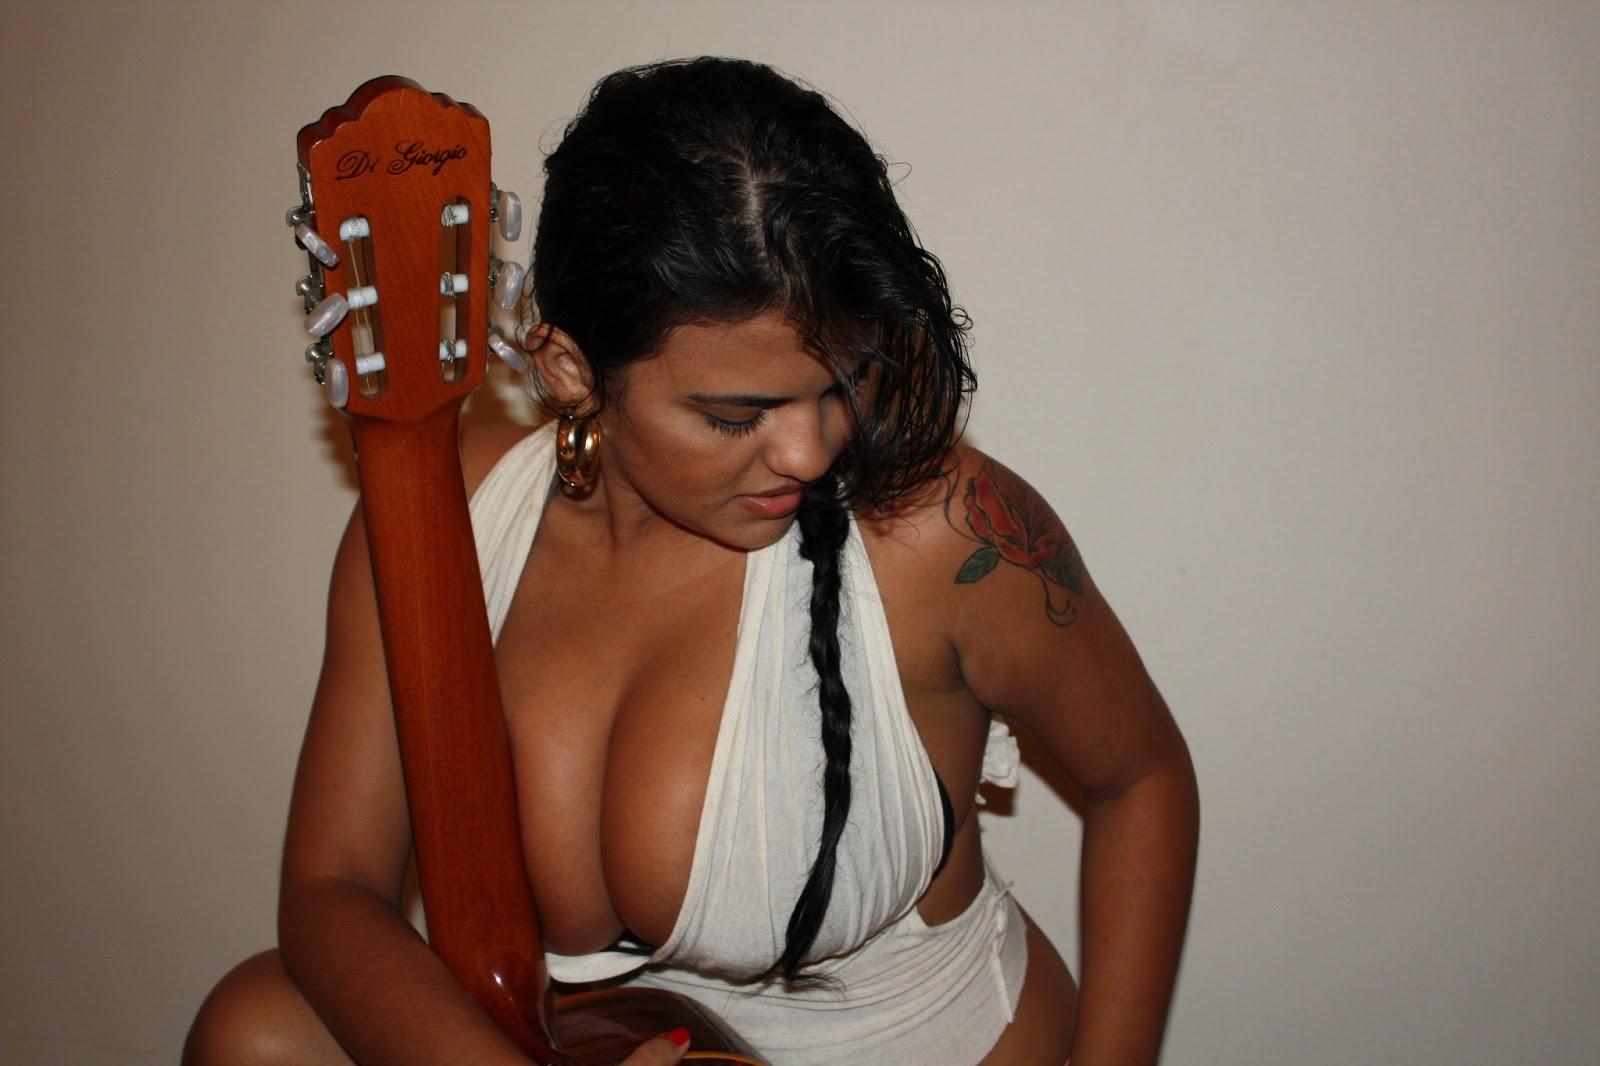 Andria Zammi hot anal sex: actriu brasilenya katrina drew (andria zammi)